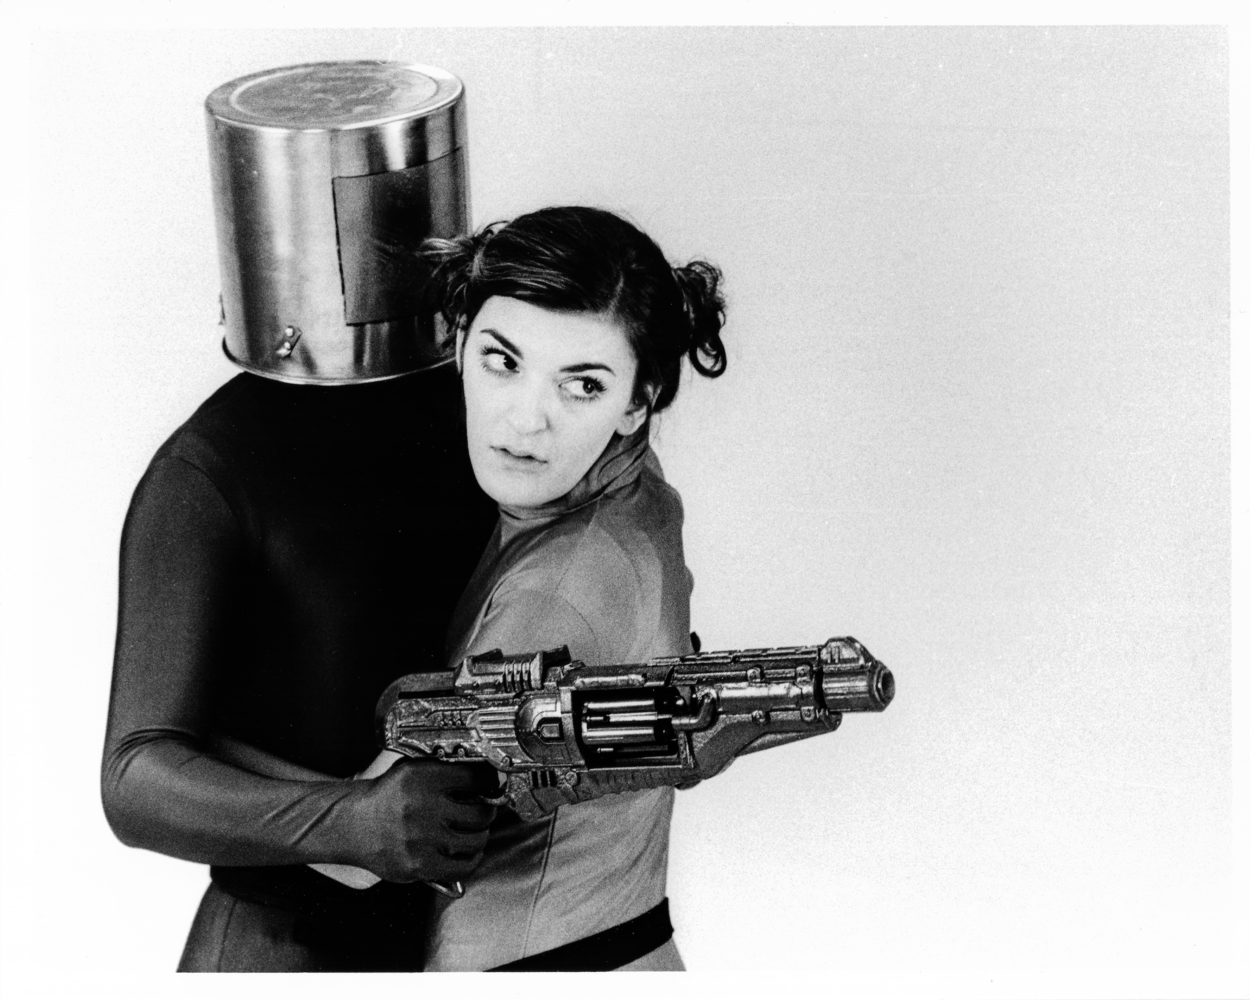 Pulp Fiction 2 by Stephen Schafer